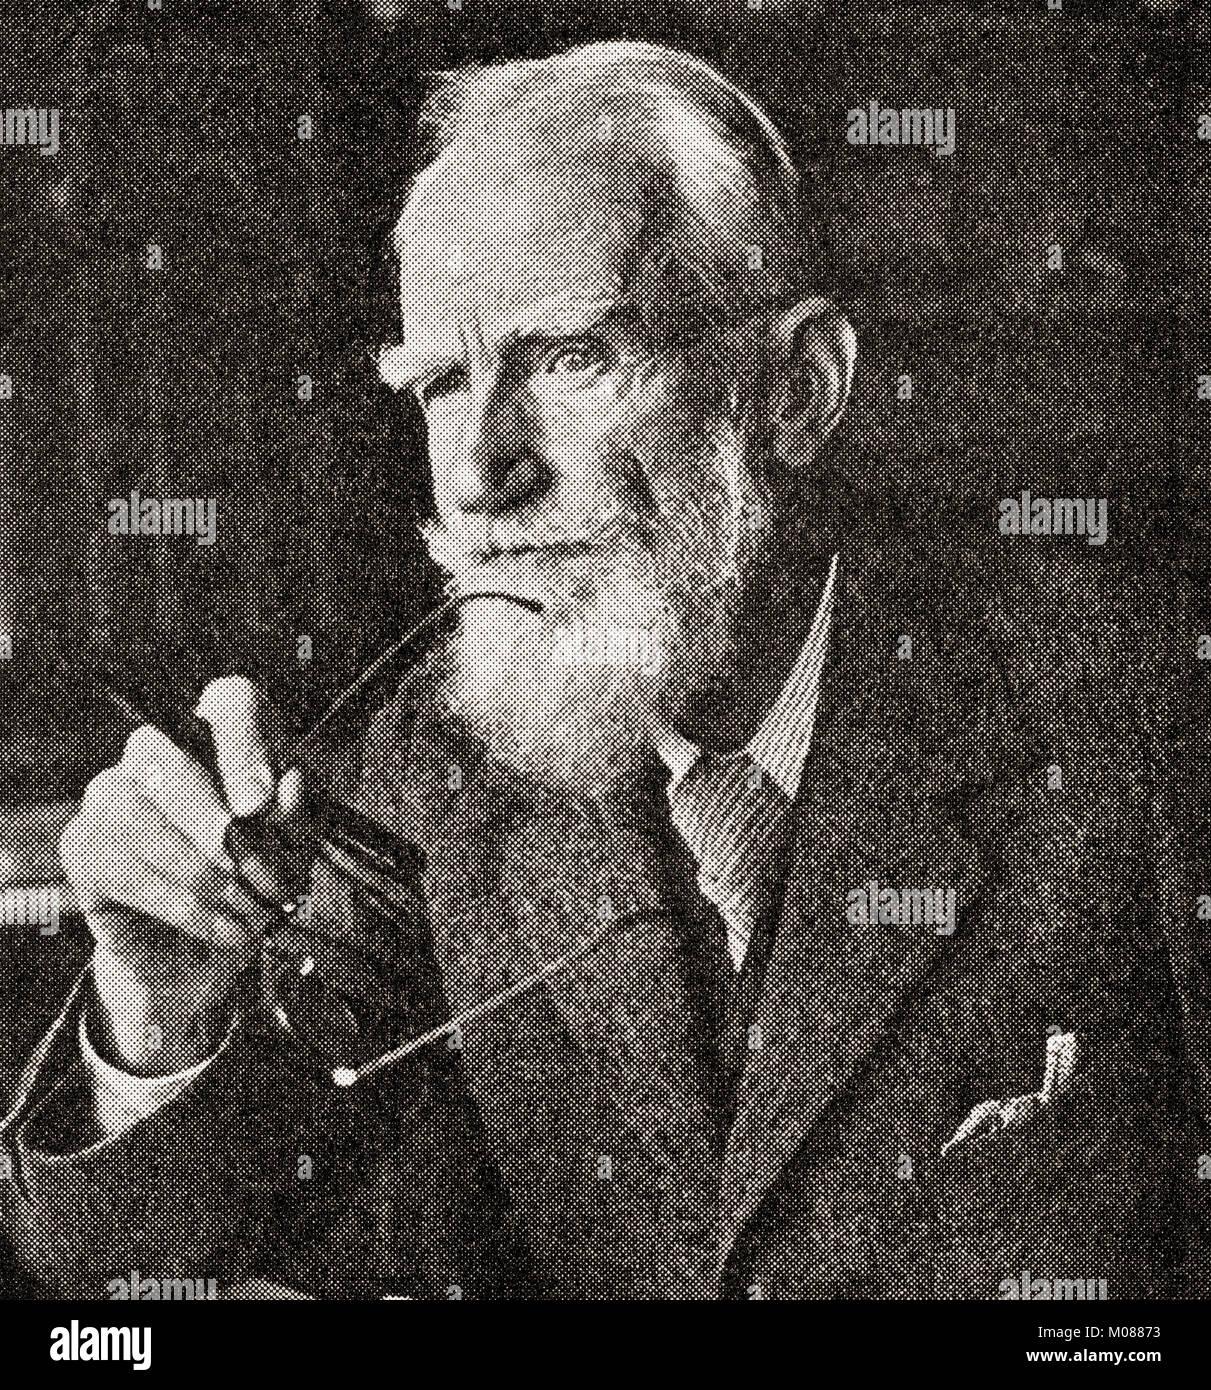 George Bernard Shaw,1856 –  1950, aka Bernard Shaw.  Irish playwright, critic, polemicist, and political activist. - Stock Image